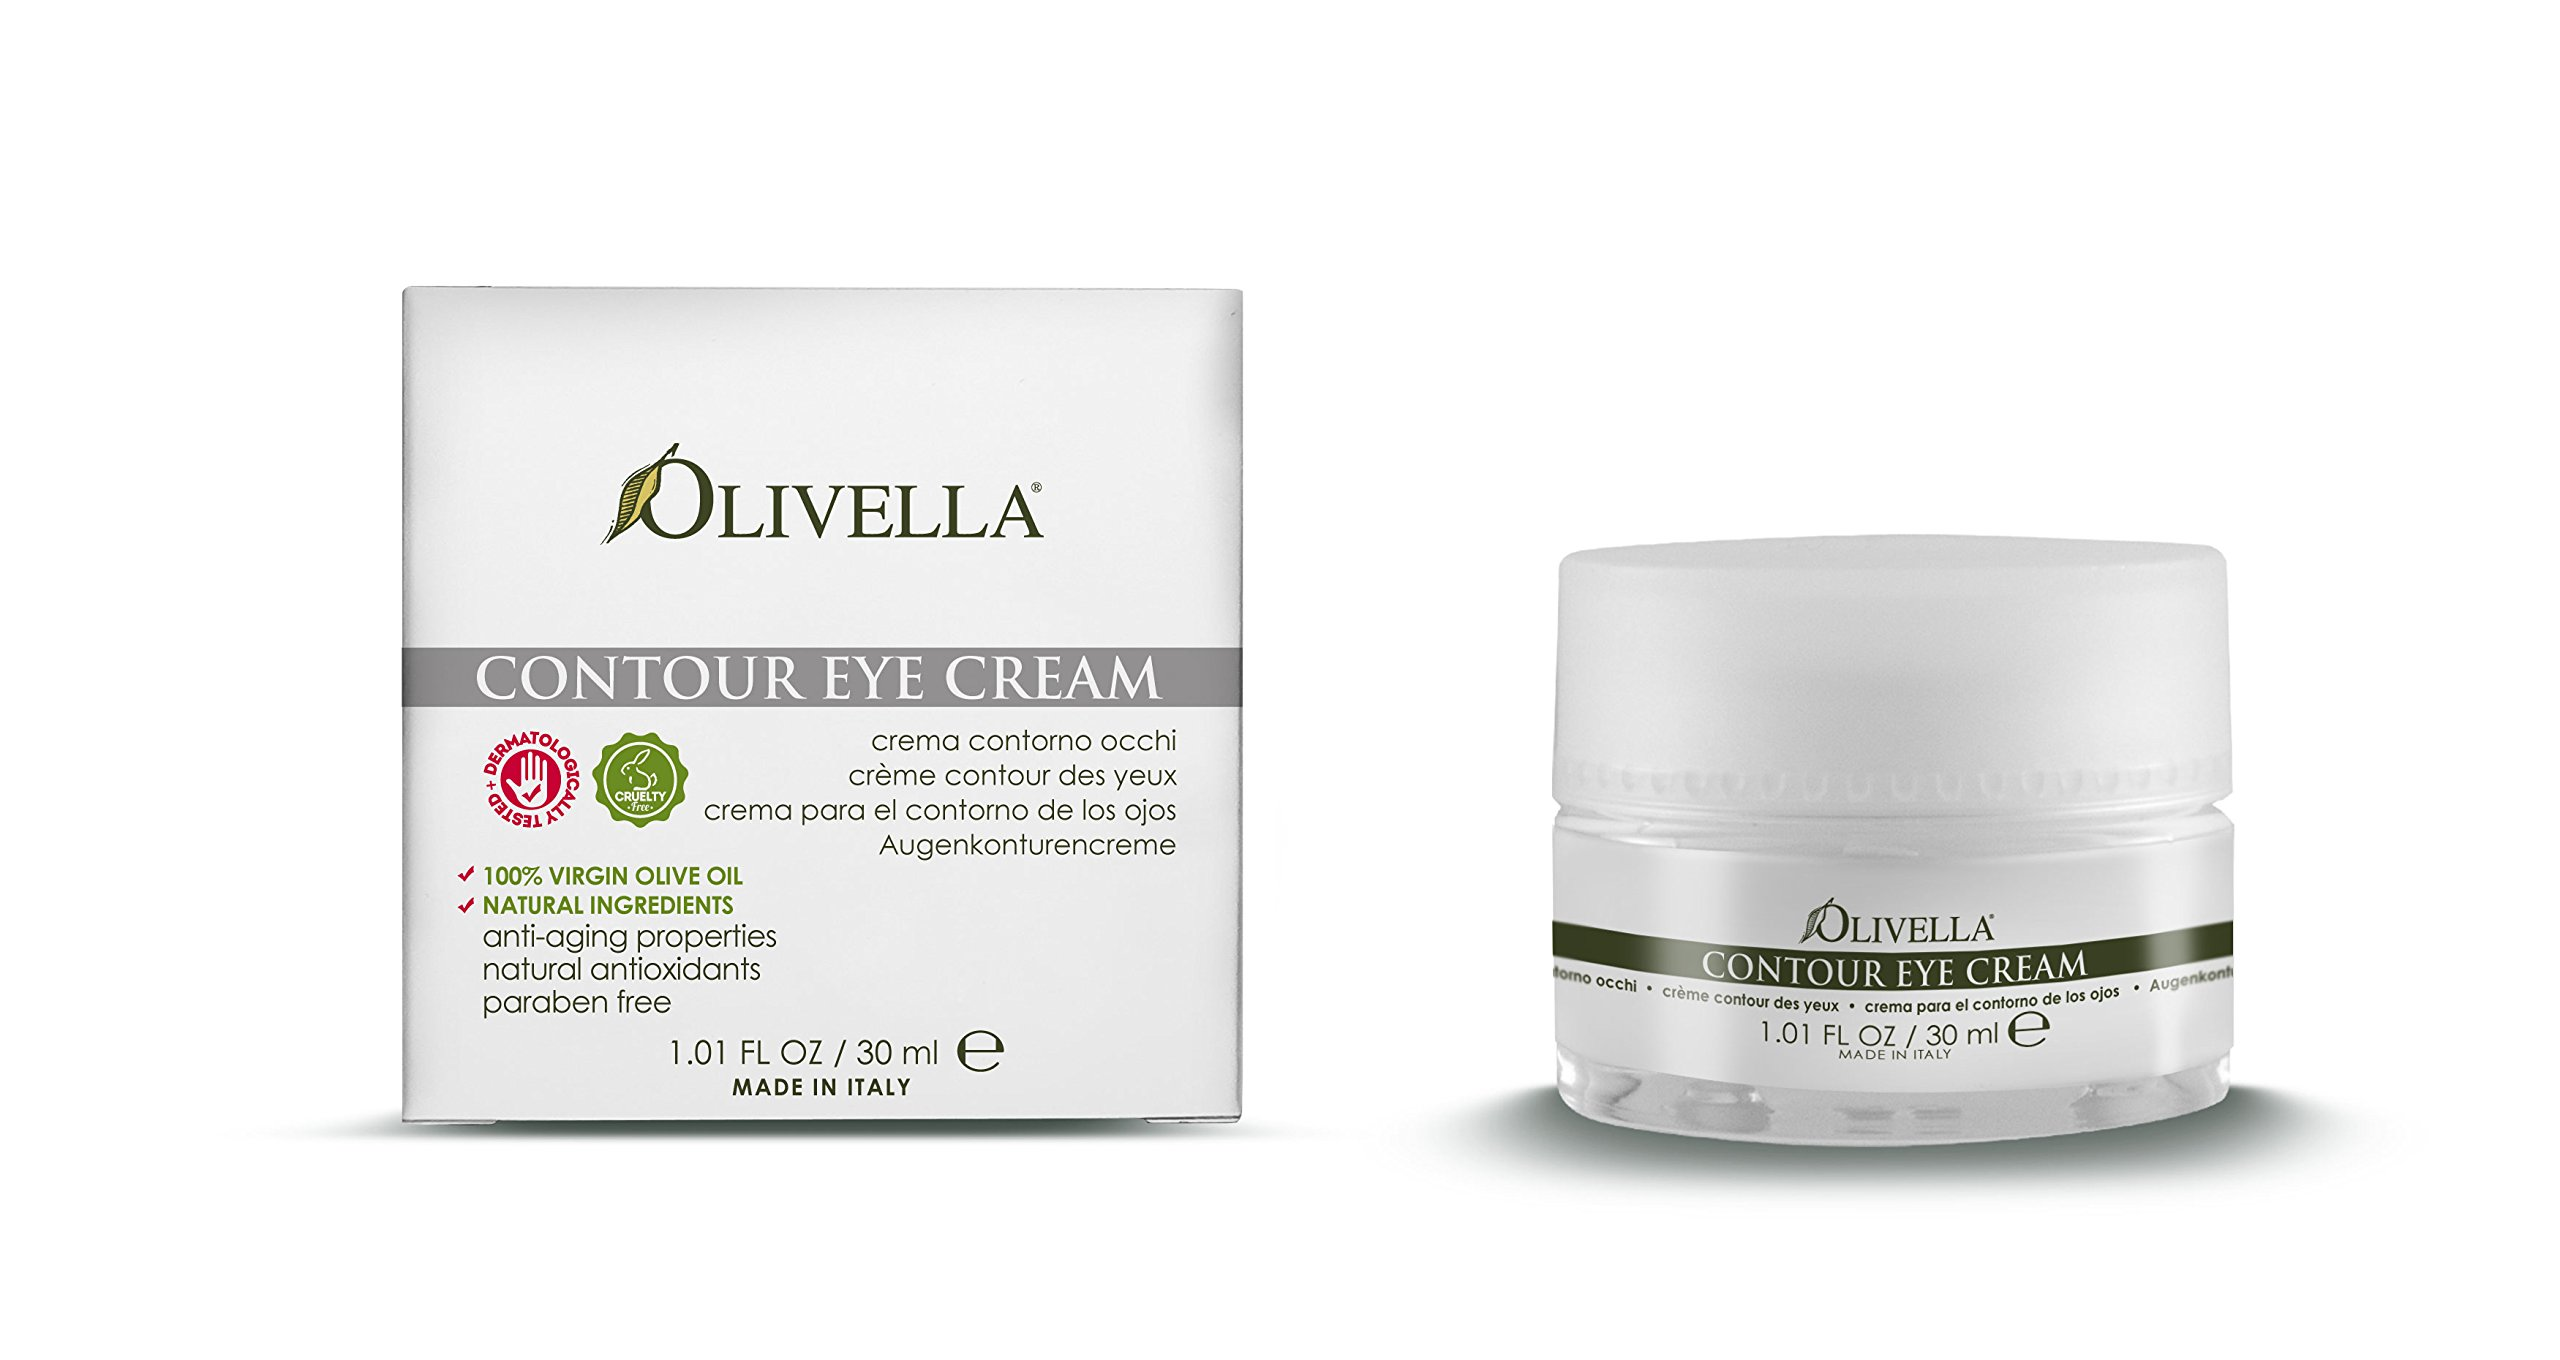 OLIVELLA Contour Eye Cream, Olive, 1.01 Fluid Ounce